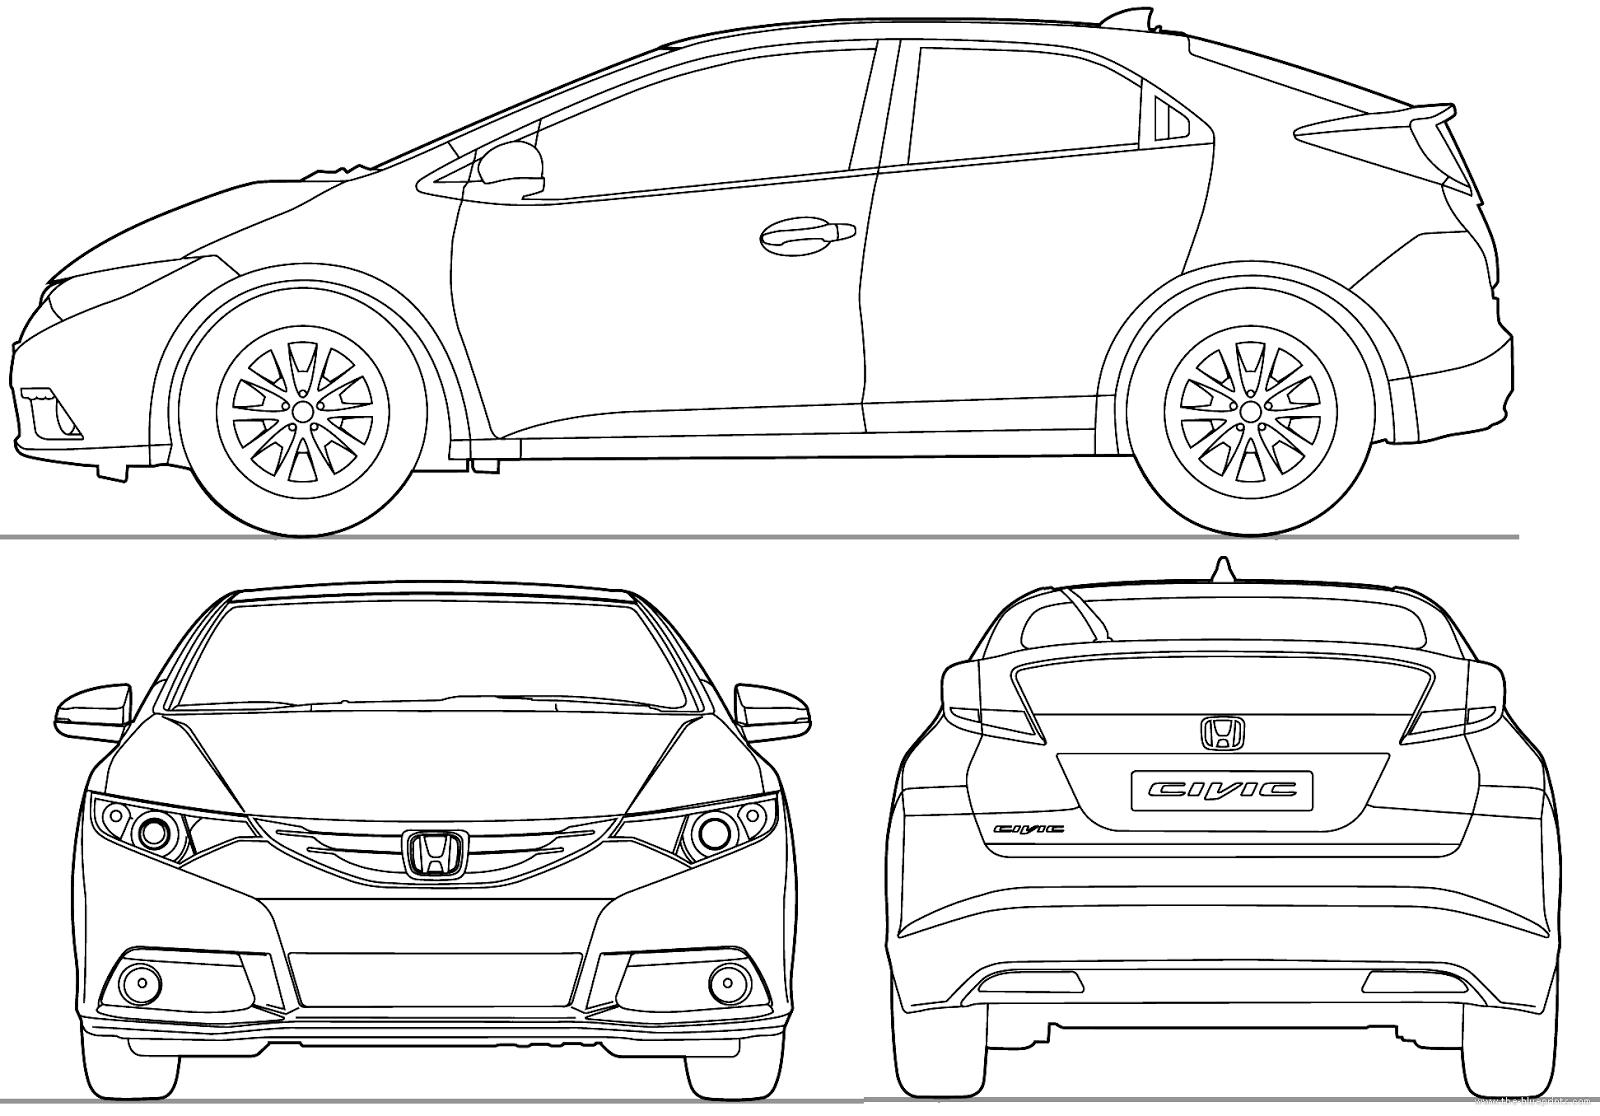 Bmw Motorsport Logo also About Us moreover Bmw E90 Warning Lights Explained likewise Most Loved Car Blueprints For 3d Modeling further Most Loved Car Blueprints For 3d. on bmw 3 series